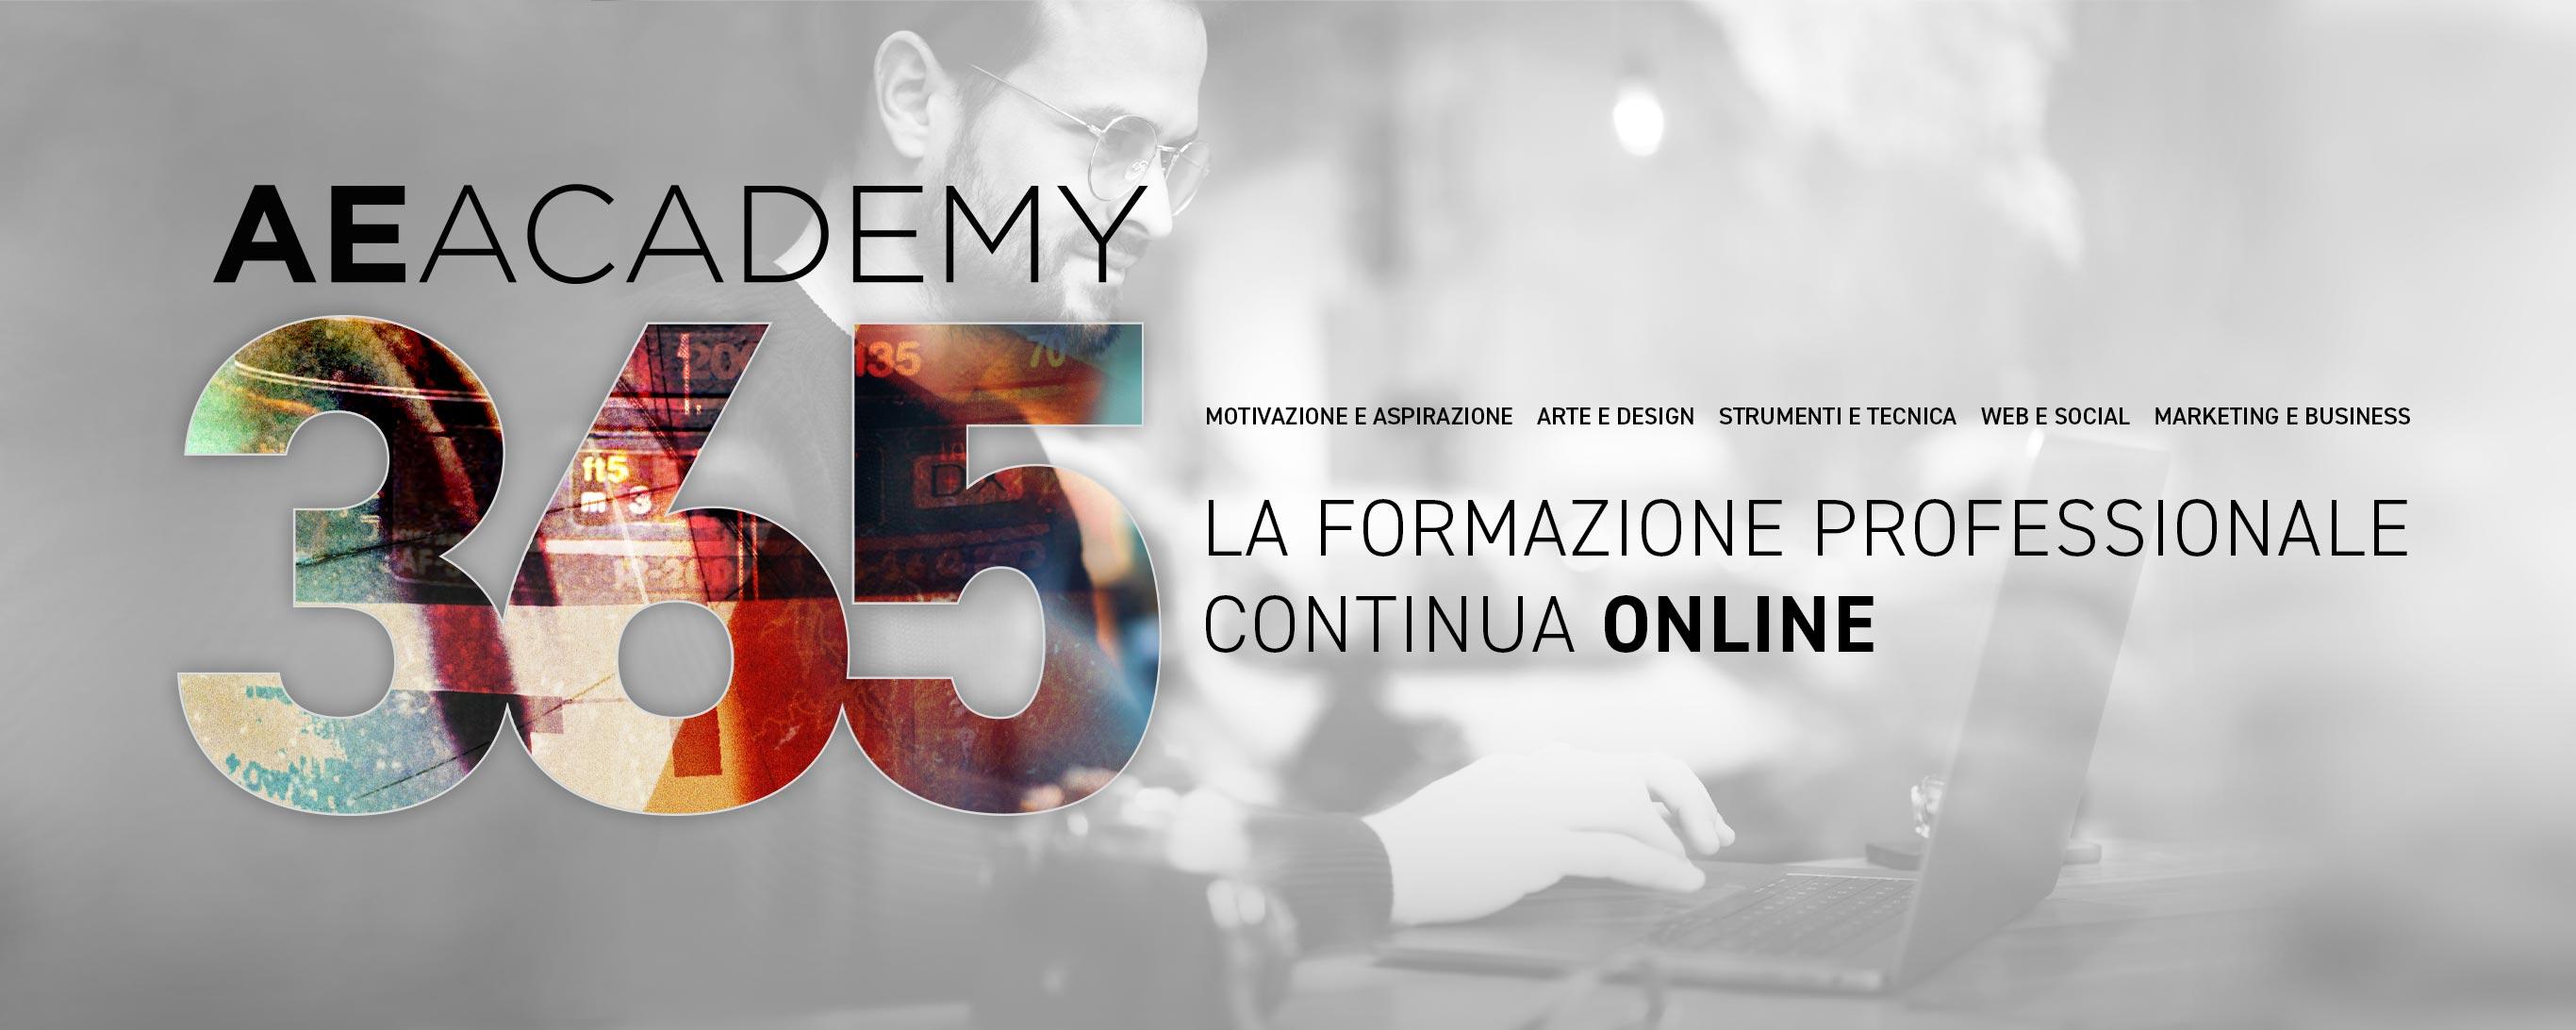 00_BN-Academy_Generico_2